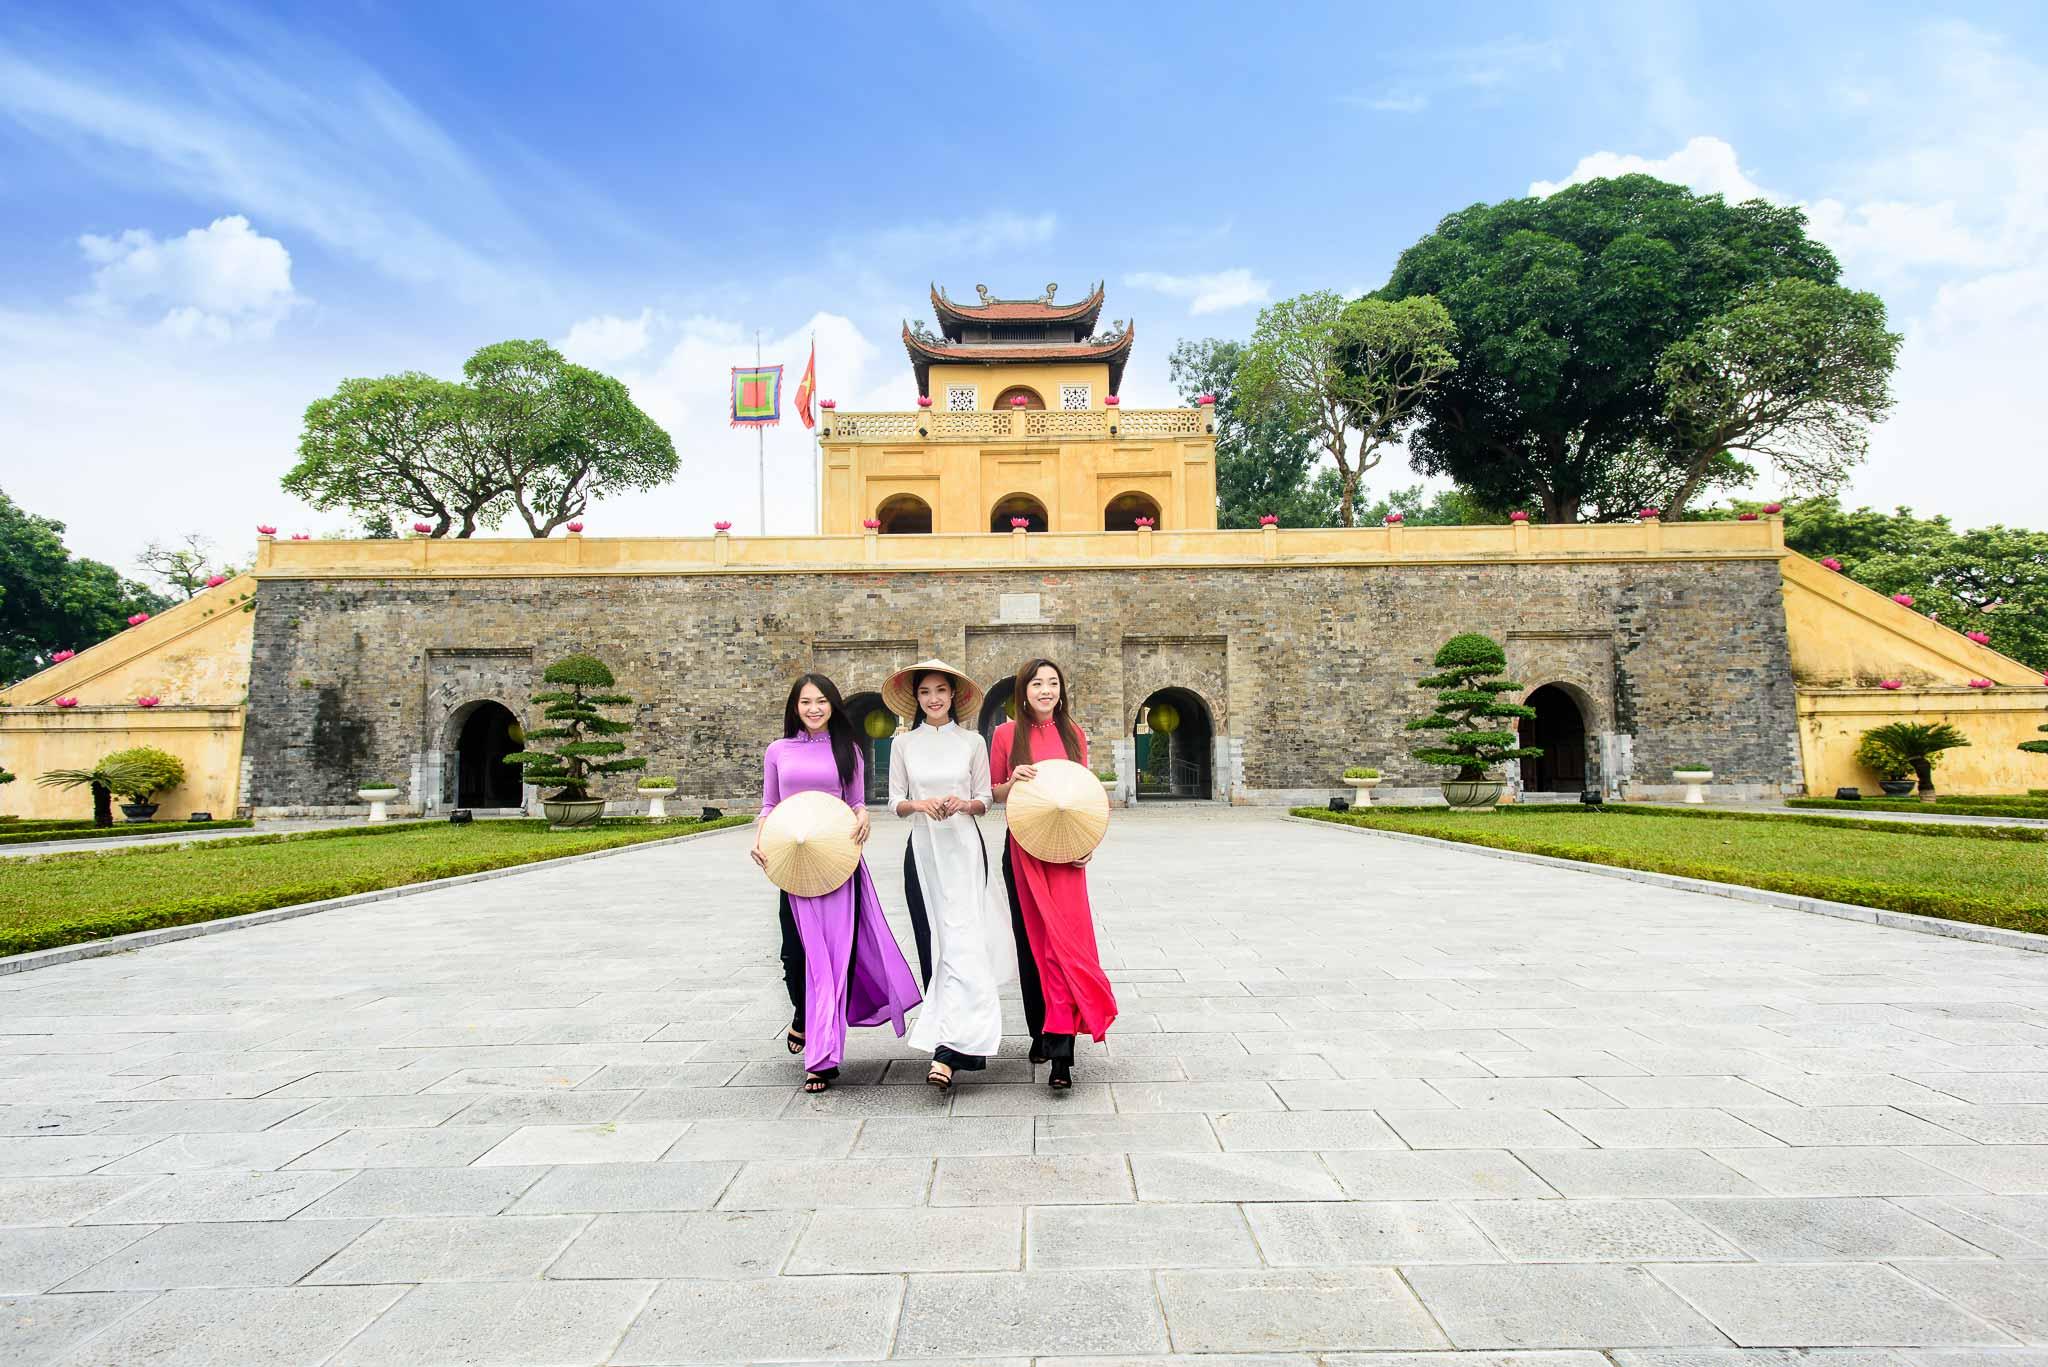 Imperial Citadel of Thang Long